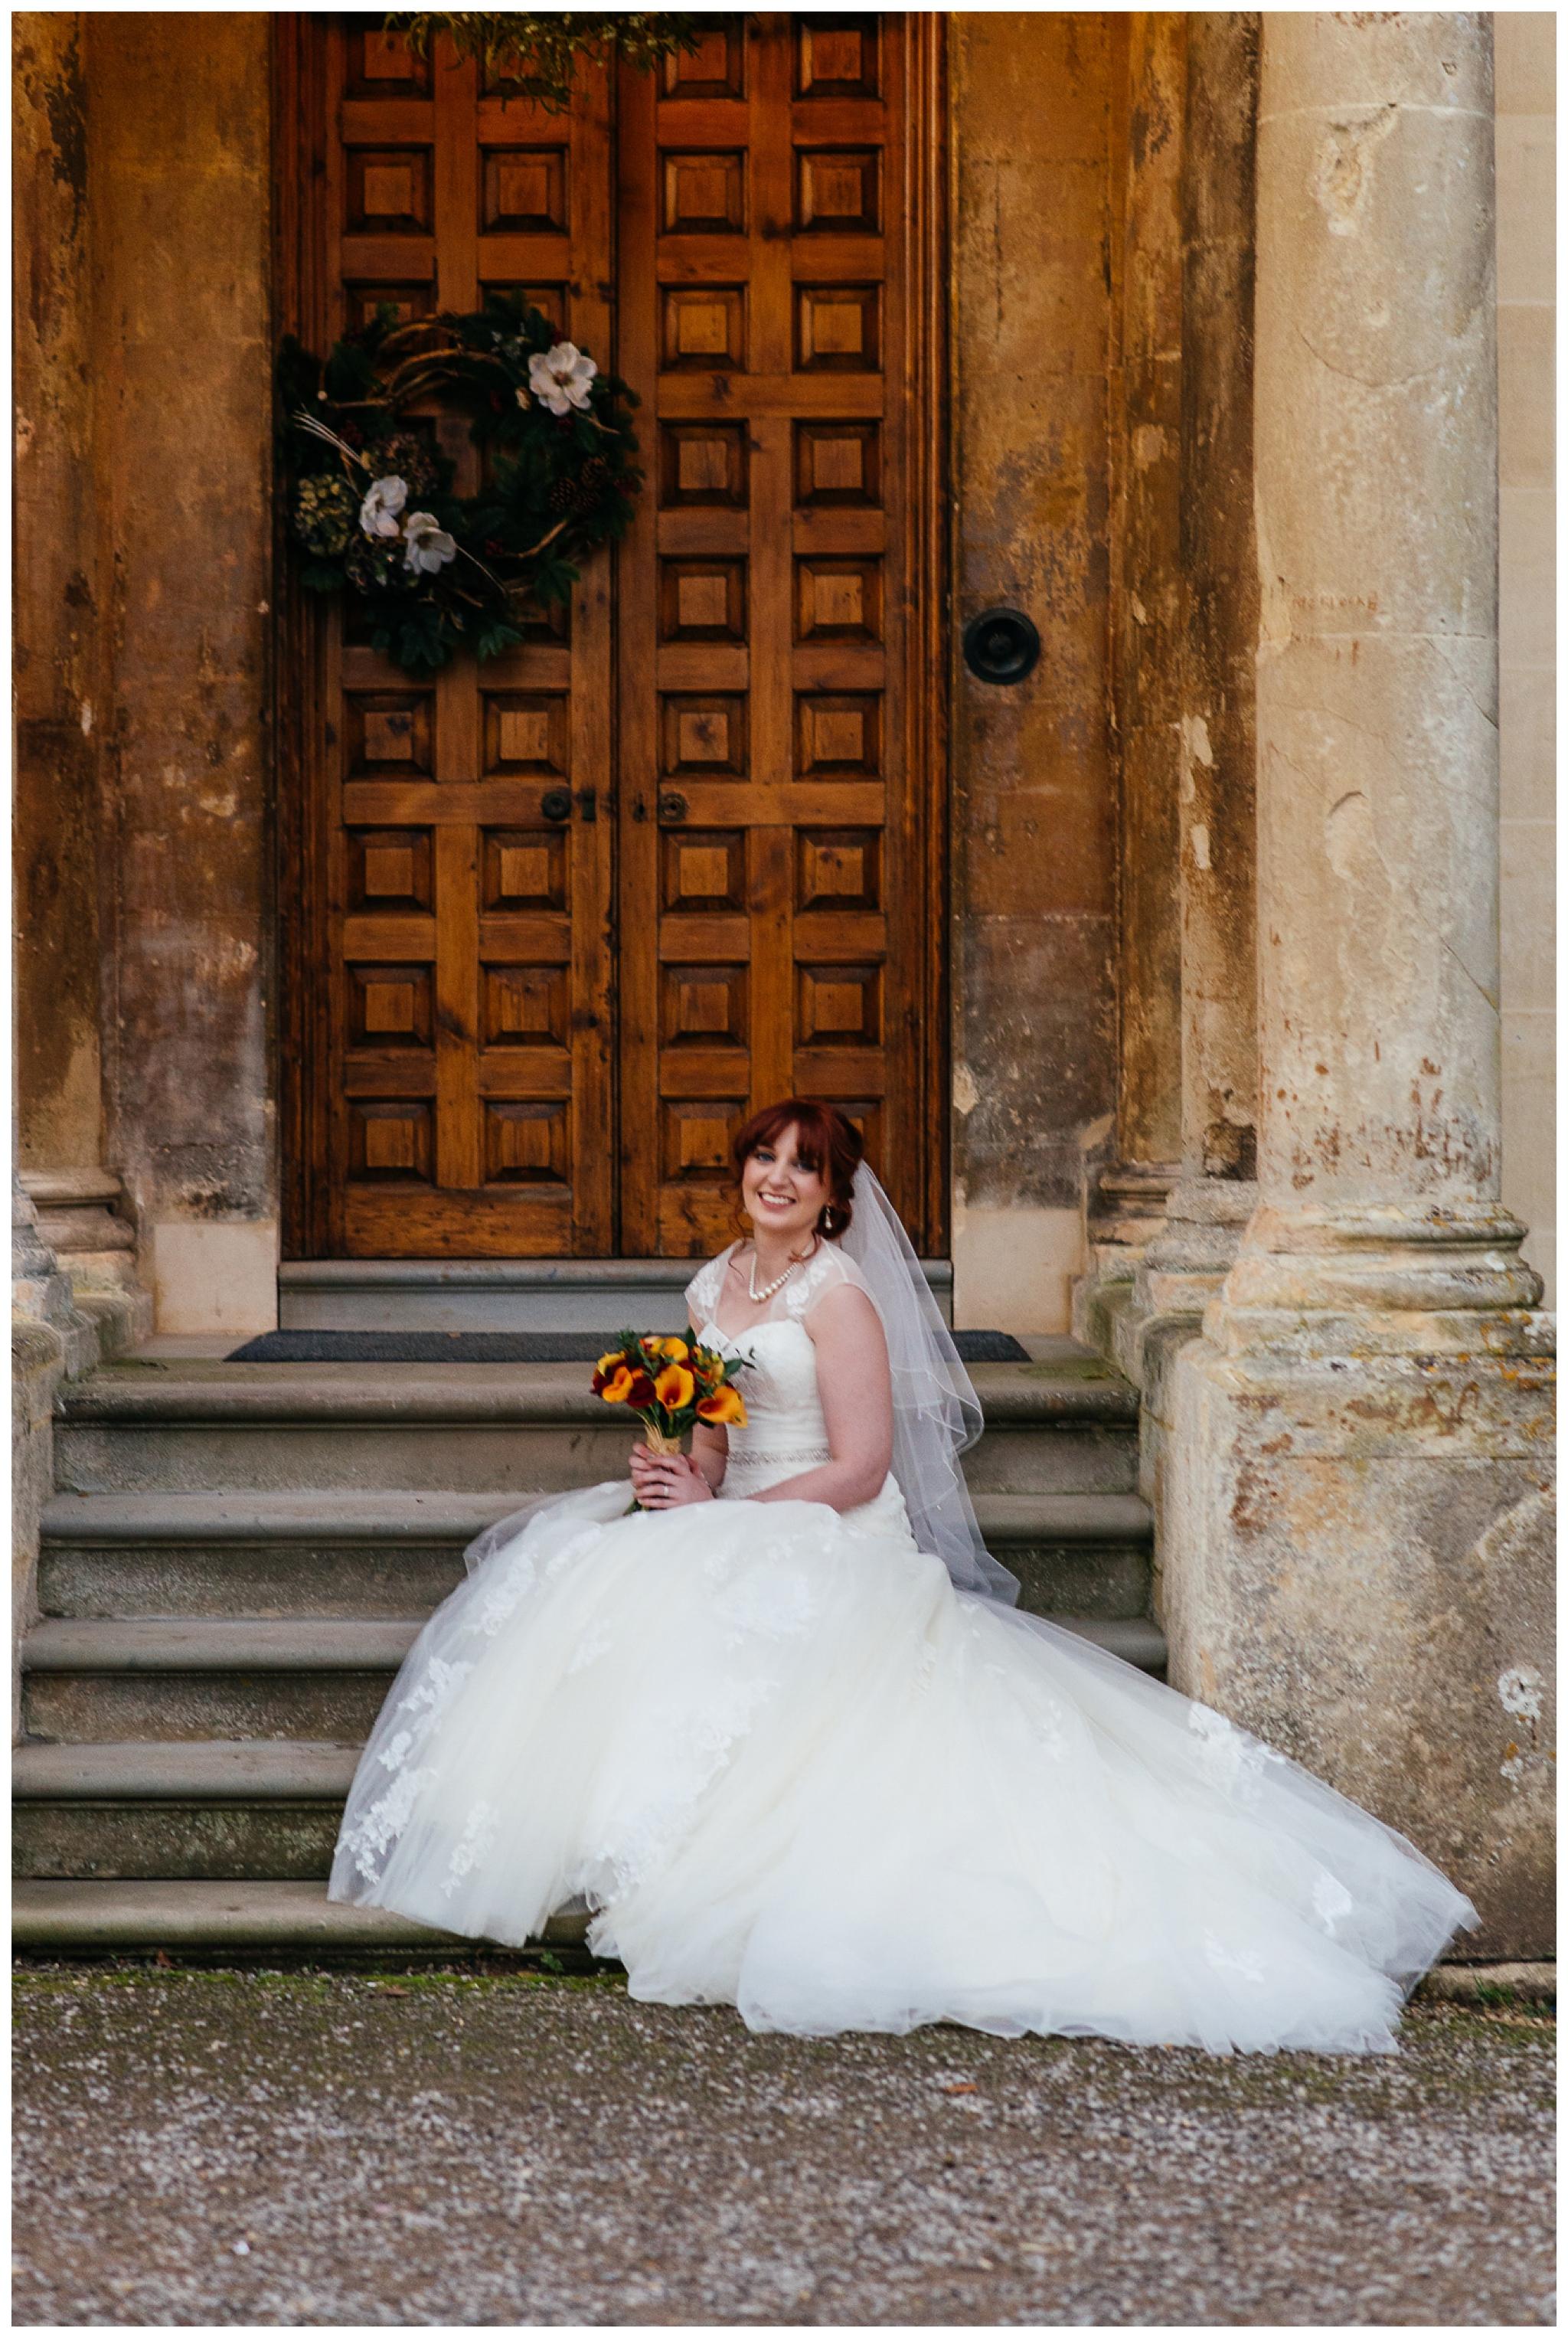 Emma&Paul-Elmore-Court-Winter-Wedding-Nikki-Cooper-Photography_0114.jpg